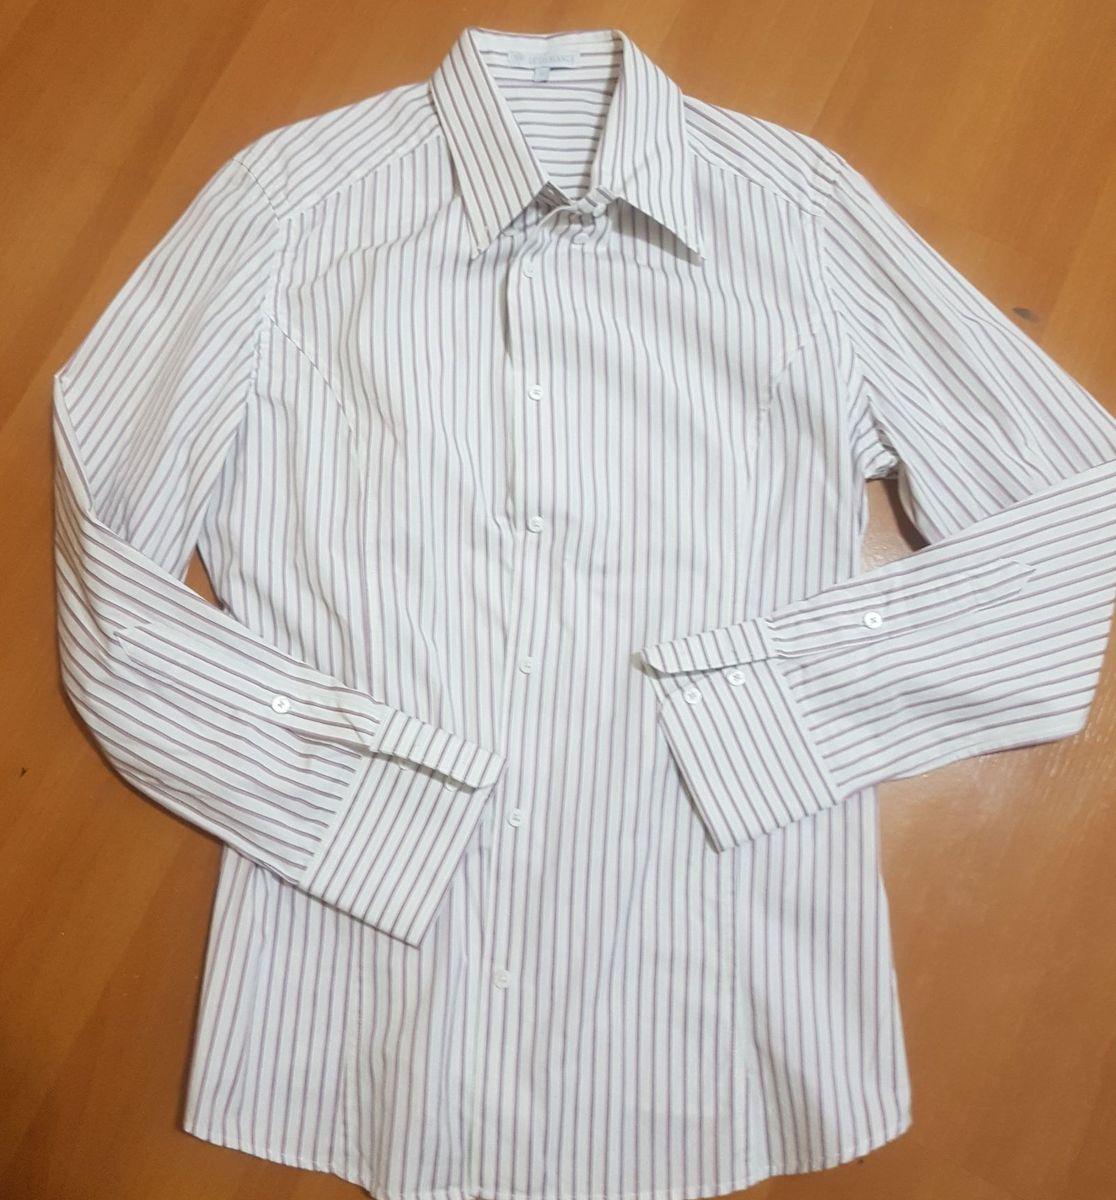 41f6f085f camisa feminina listrada - camisas le-lis-blanc.  Czm6ly9wag90b3muzw5qb2vplmnvbs5ici9wcm9kdwn0cy81njq1odk0lzfimmu3mty2yjkwyja3mwyzmjaxy2u3mze3mddlmwjklmpwzw  ...